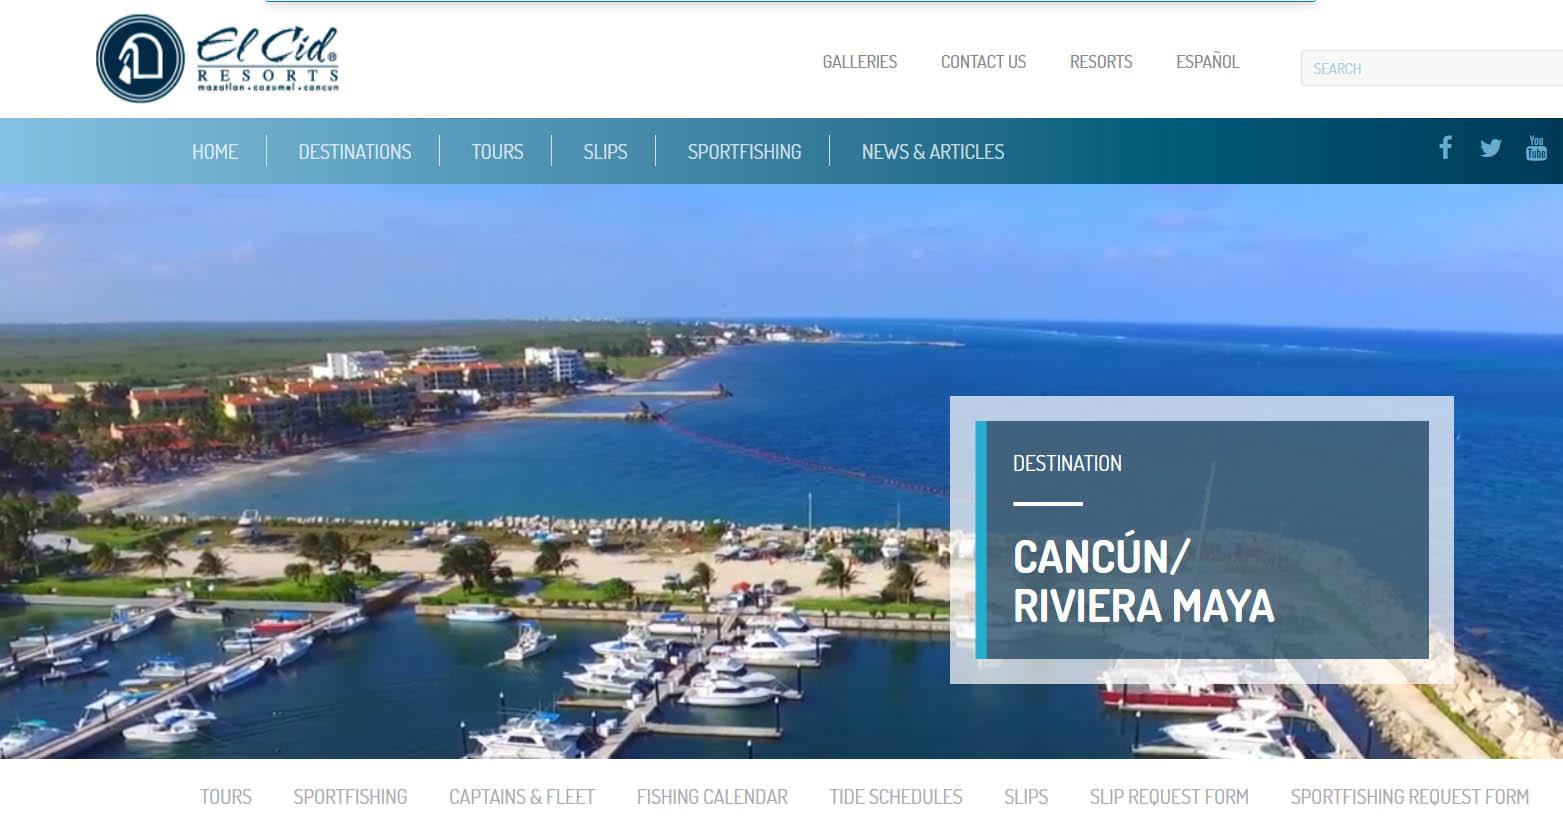 https://elcidmarinas.com/destination/destination-cancun-riviera-maya/